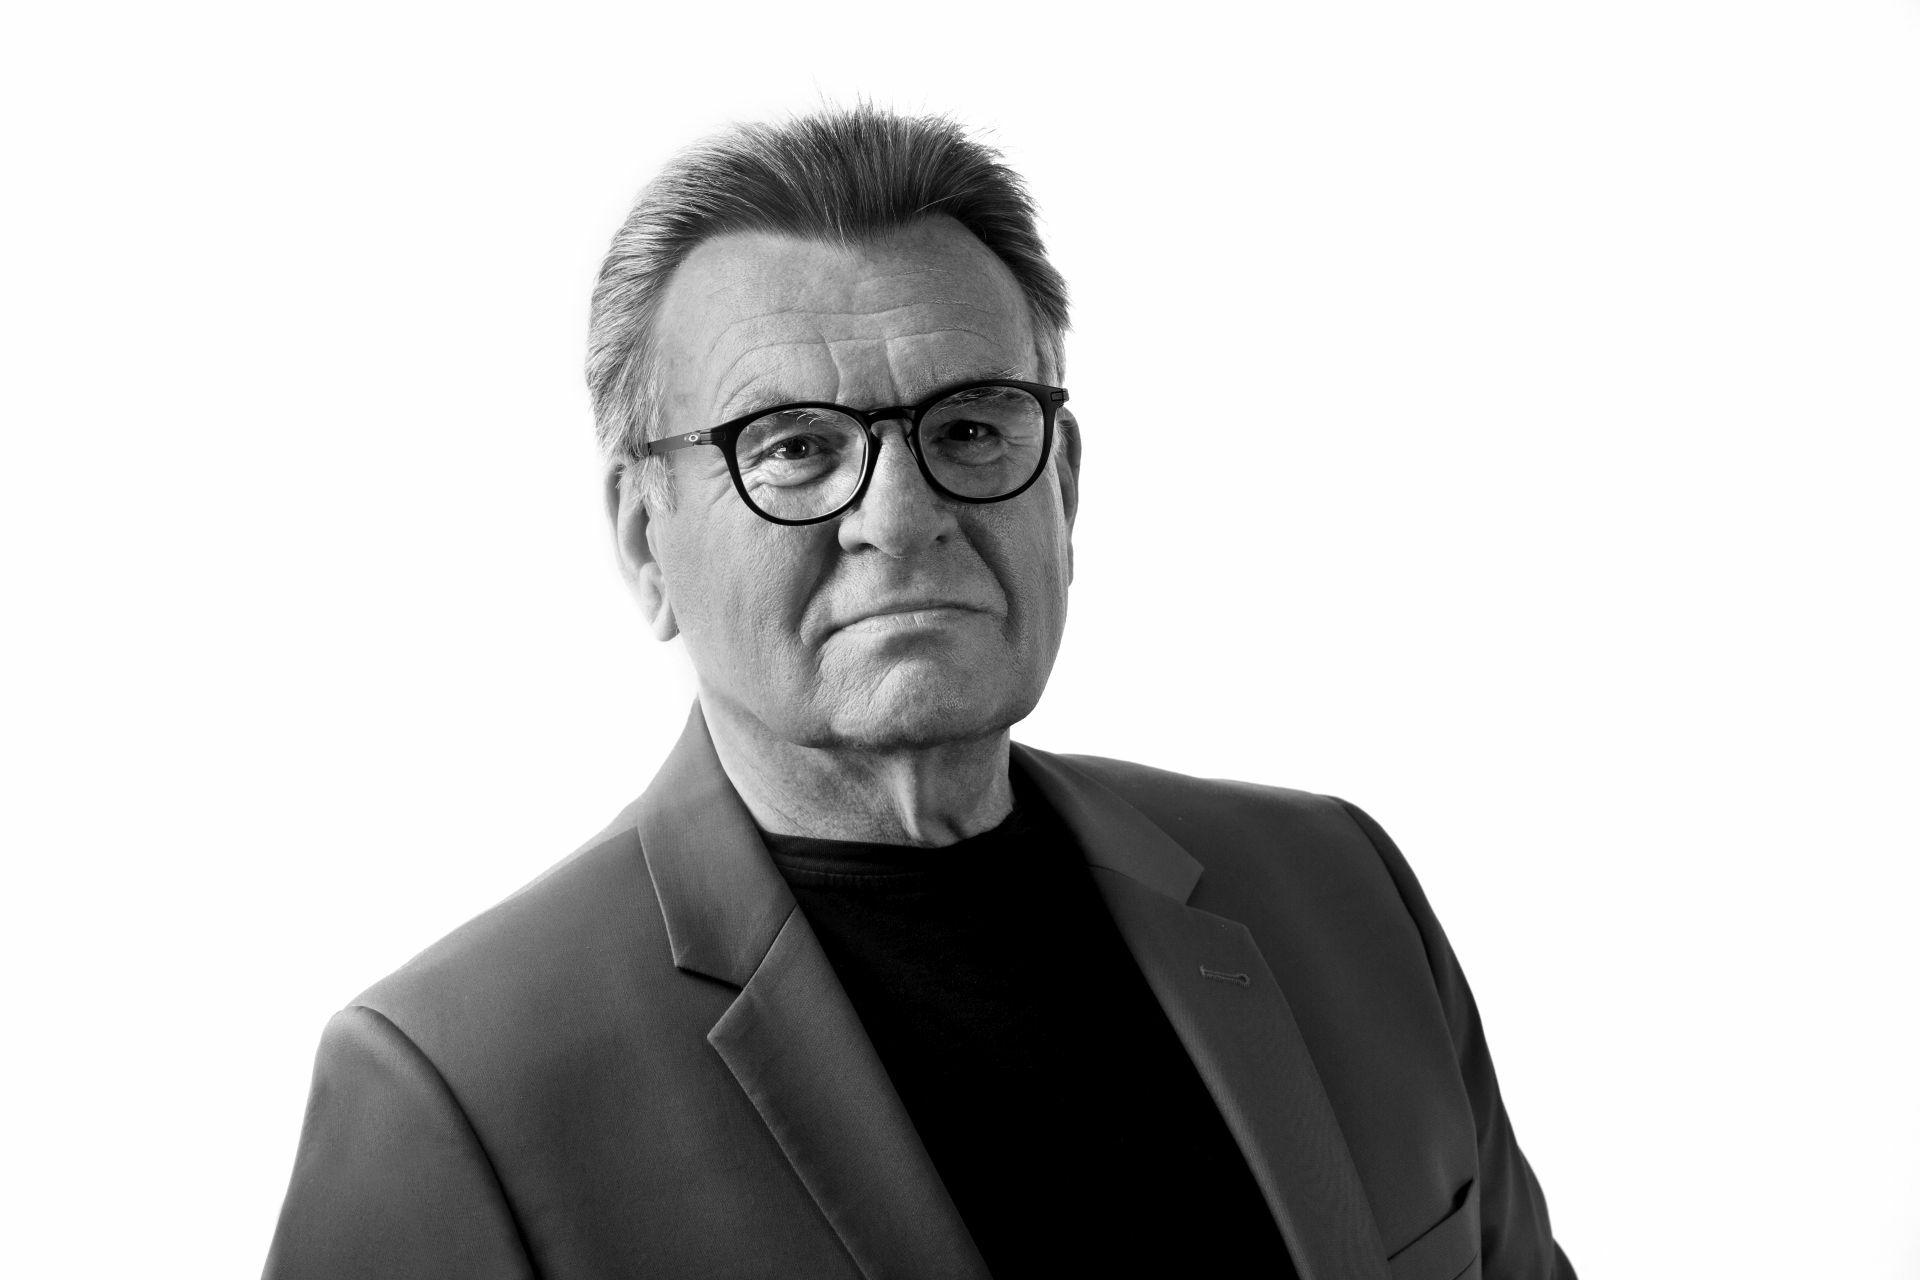 Der 72jährige emeritierte Professor Lothar Machtan